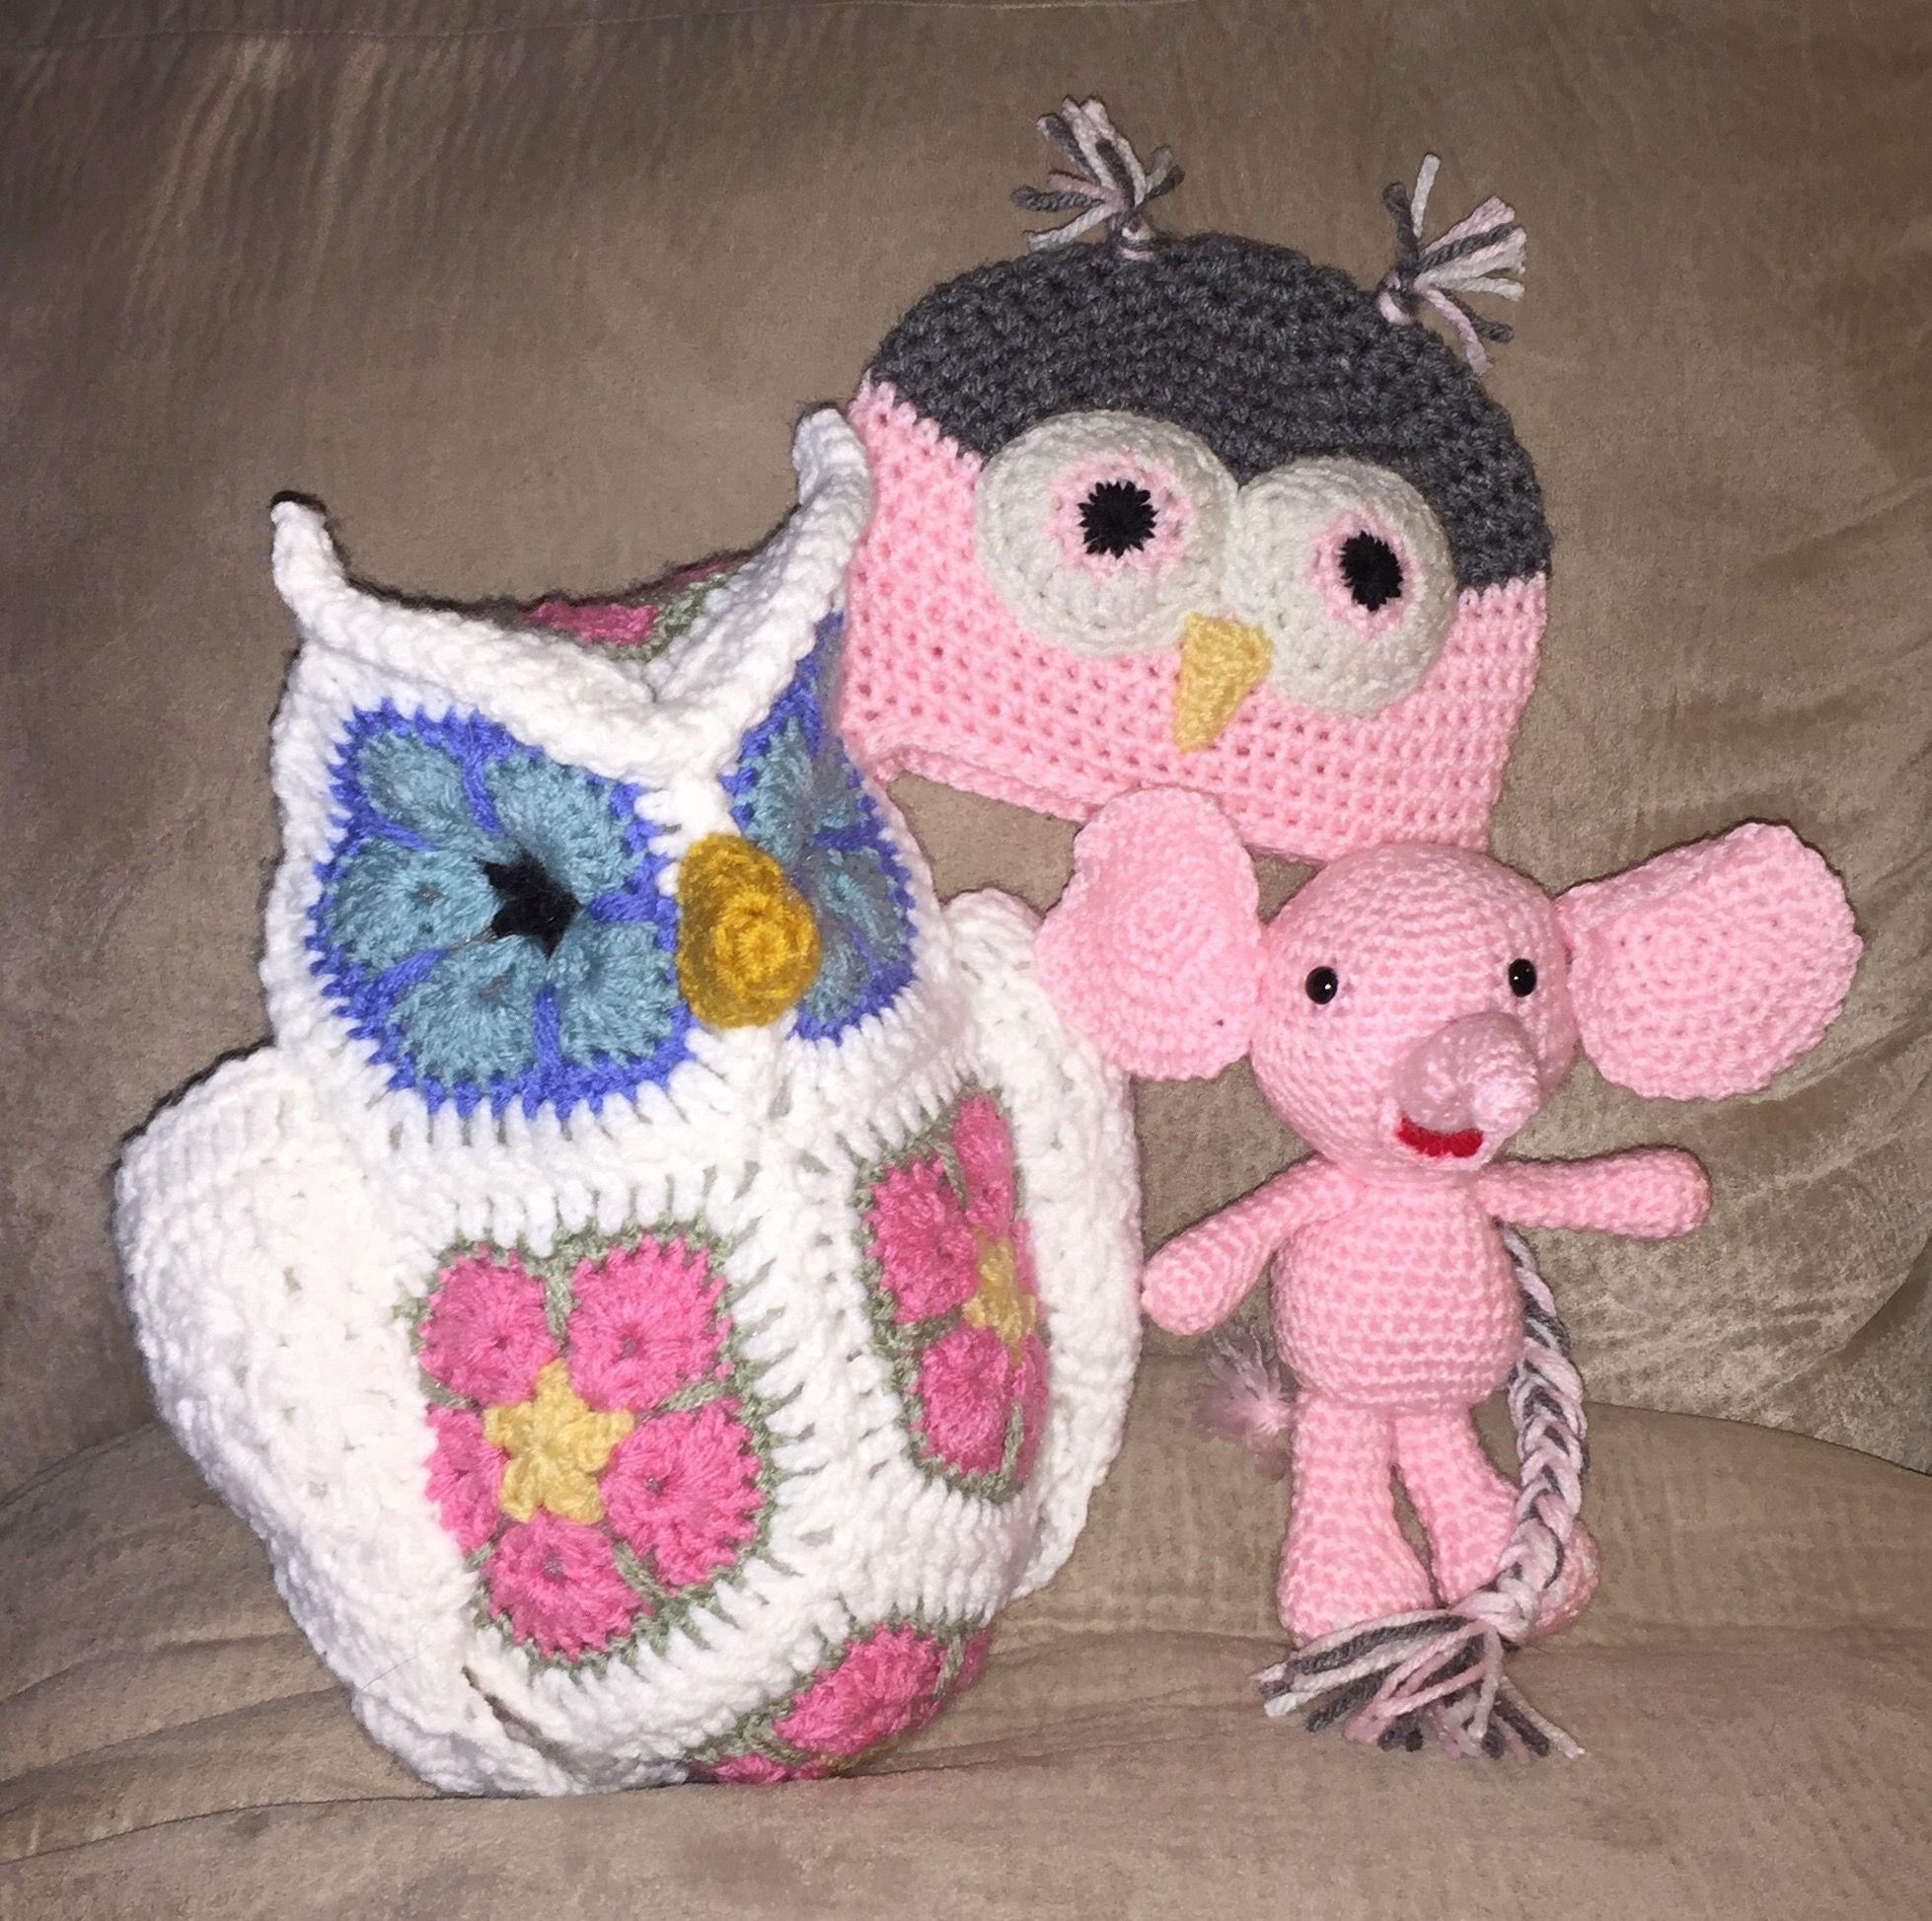 Pin de Dawn Lawson-Weingaertner en My Crochet - Things I\'ve Made ...